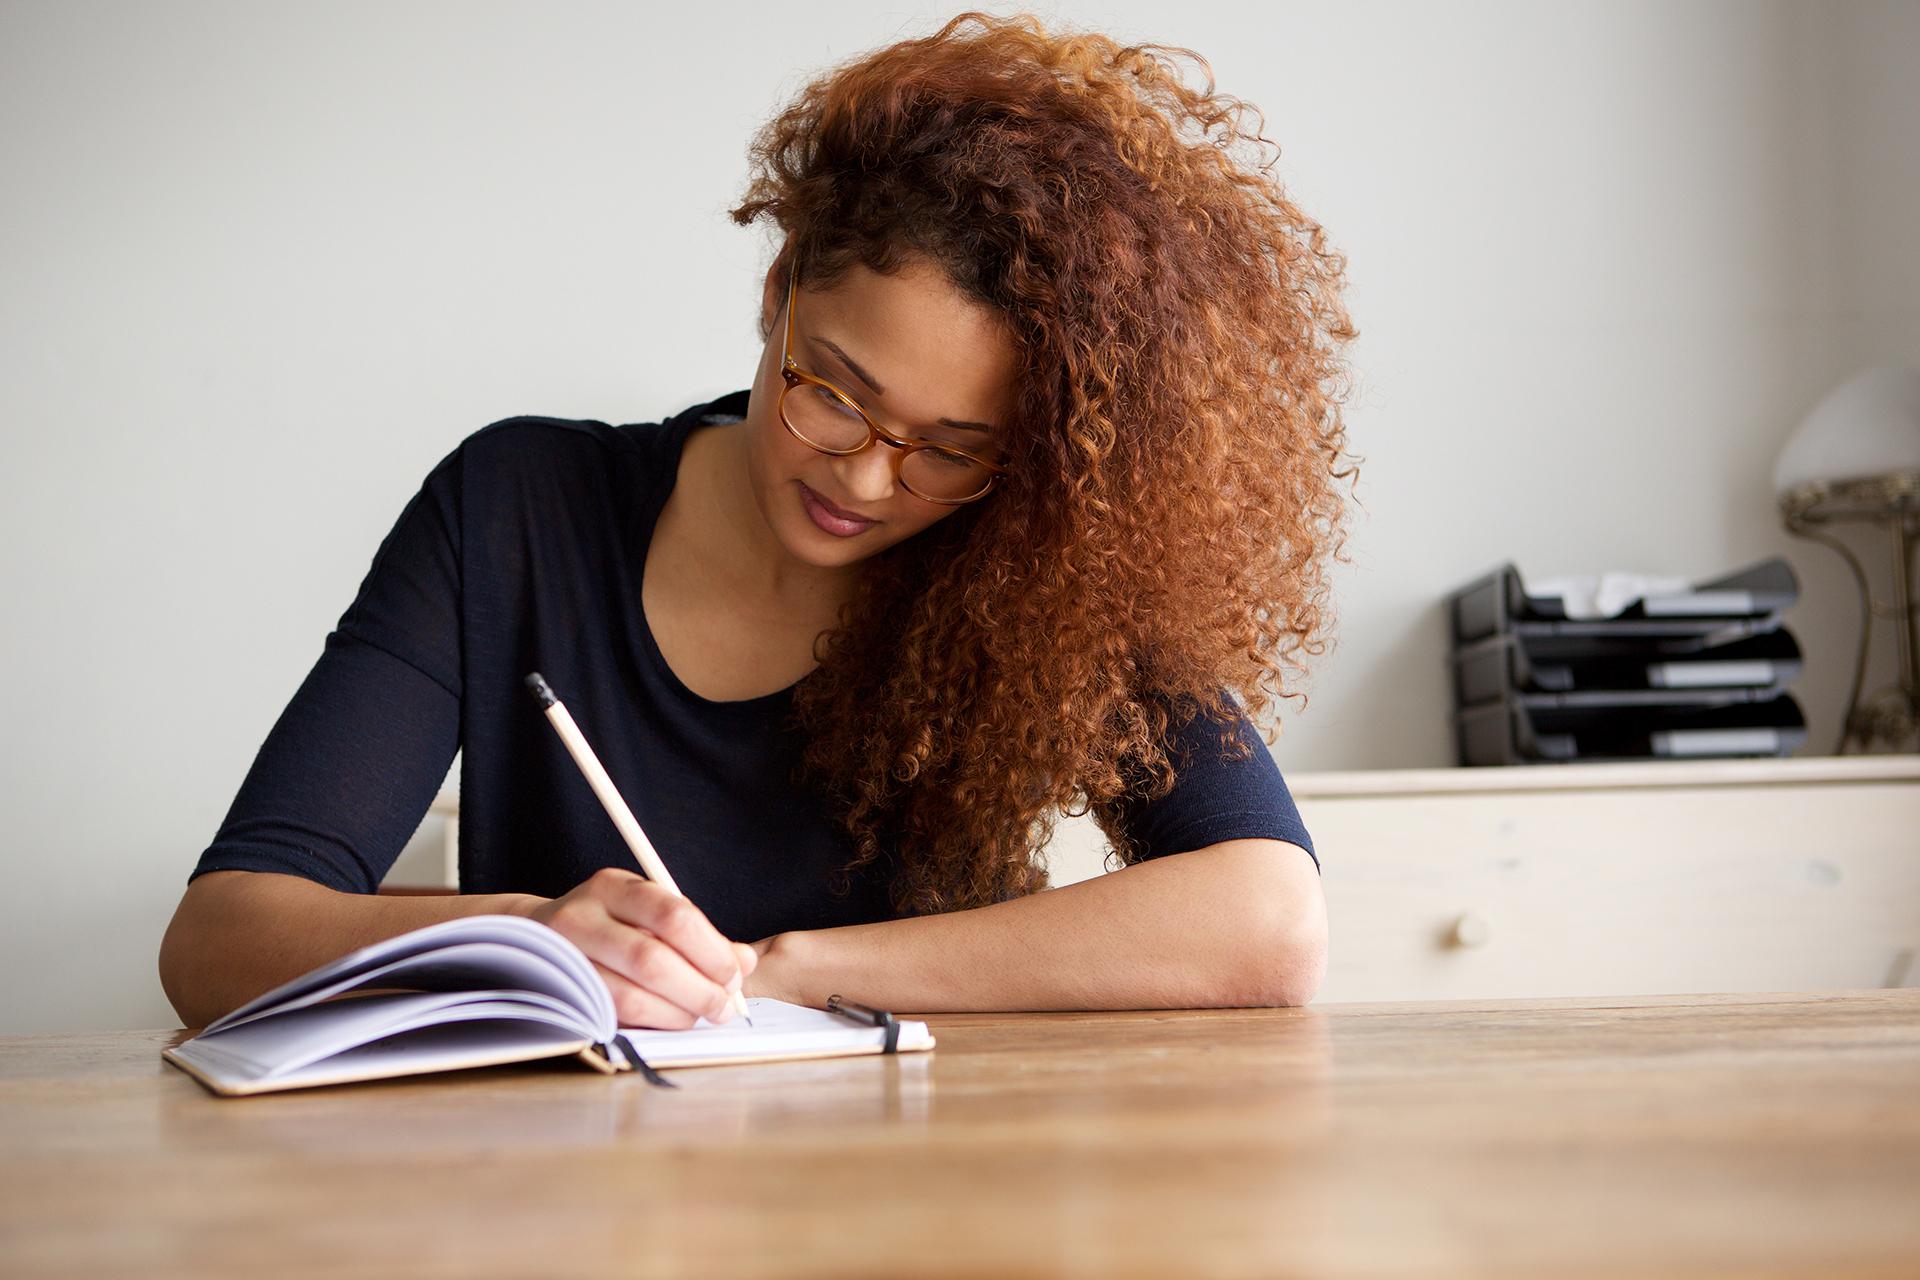 40+ Good Argumentative Essay Topic Ideas for 2021